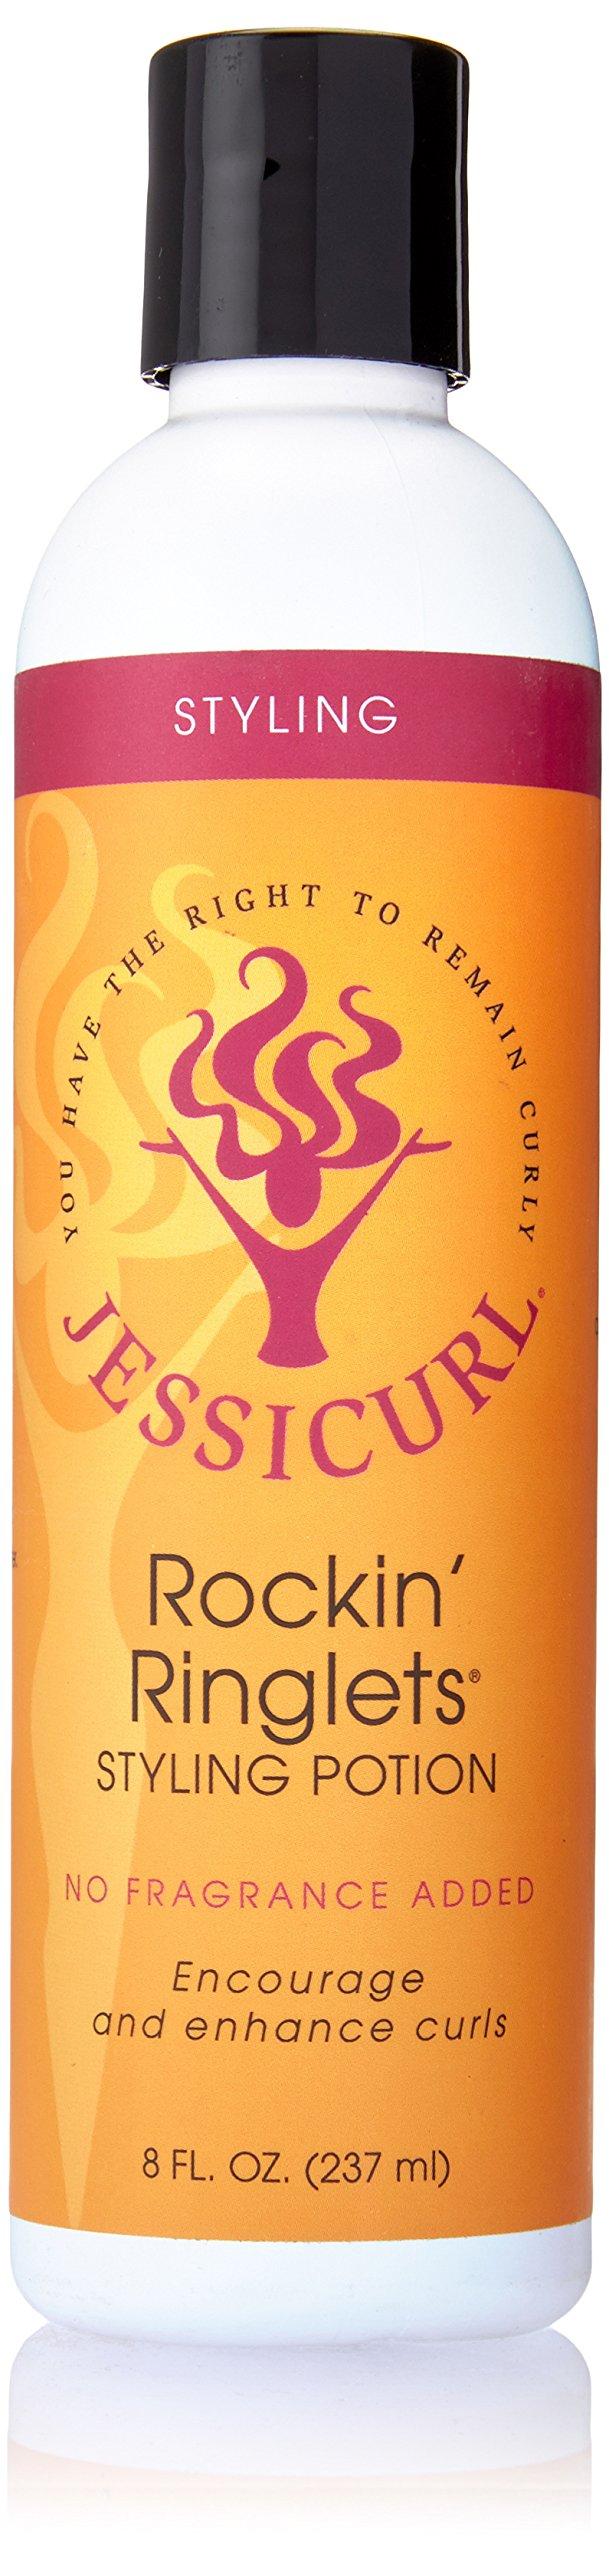 Jessicurl Rockin Ringlets Styling Potion, No Fragrance, 8 Ounce